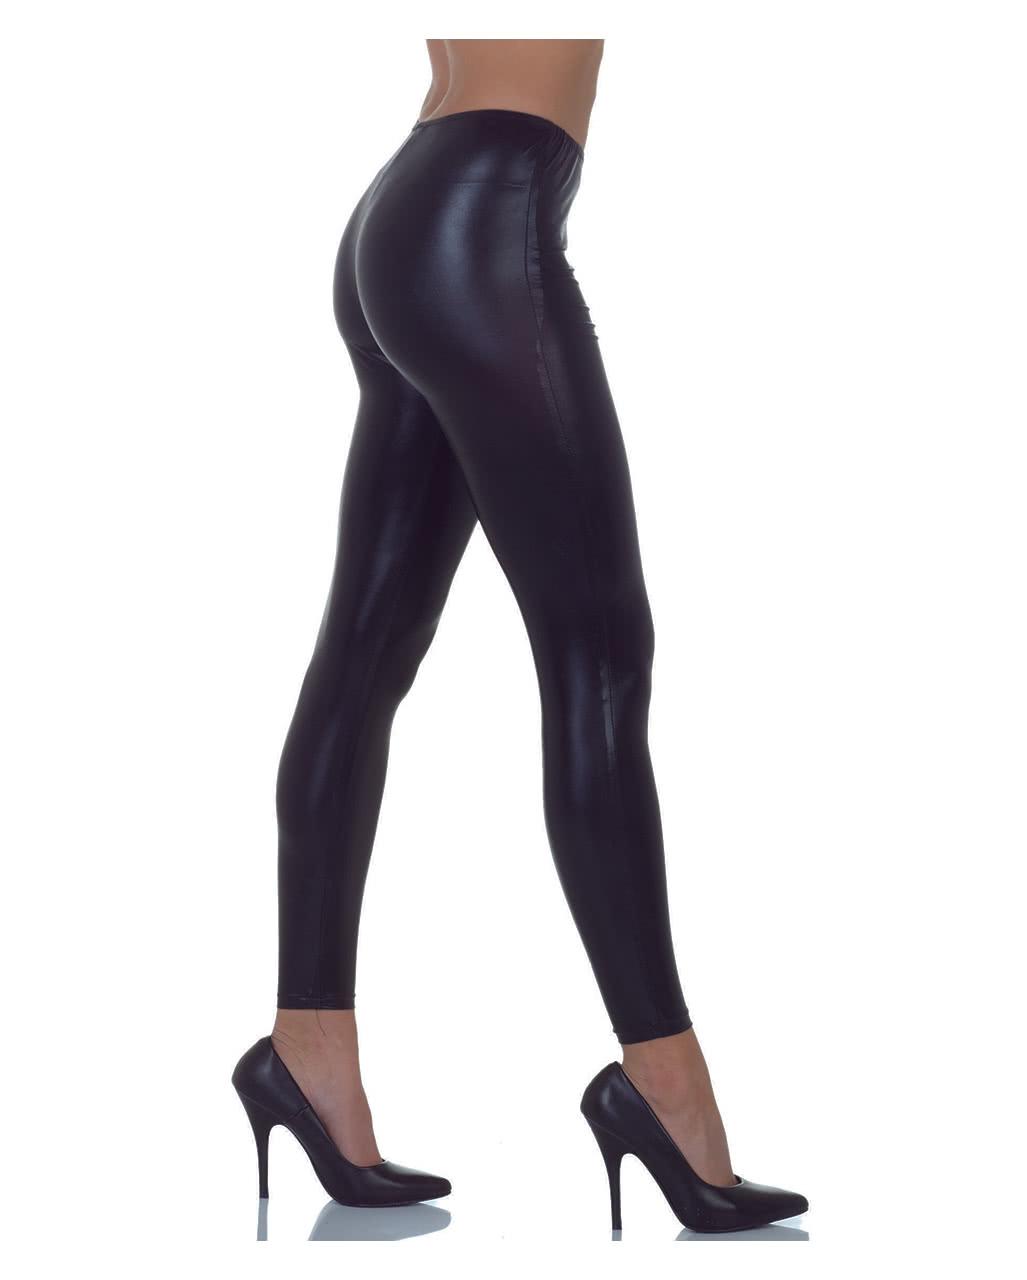 74080f655e08e Metallic Leggings Black | Wet-Look costume pants | horror-shop.com